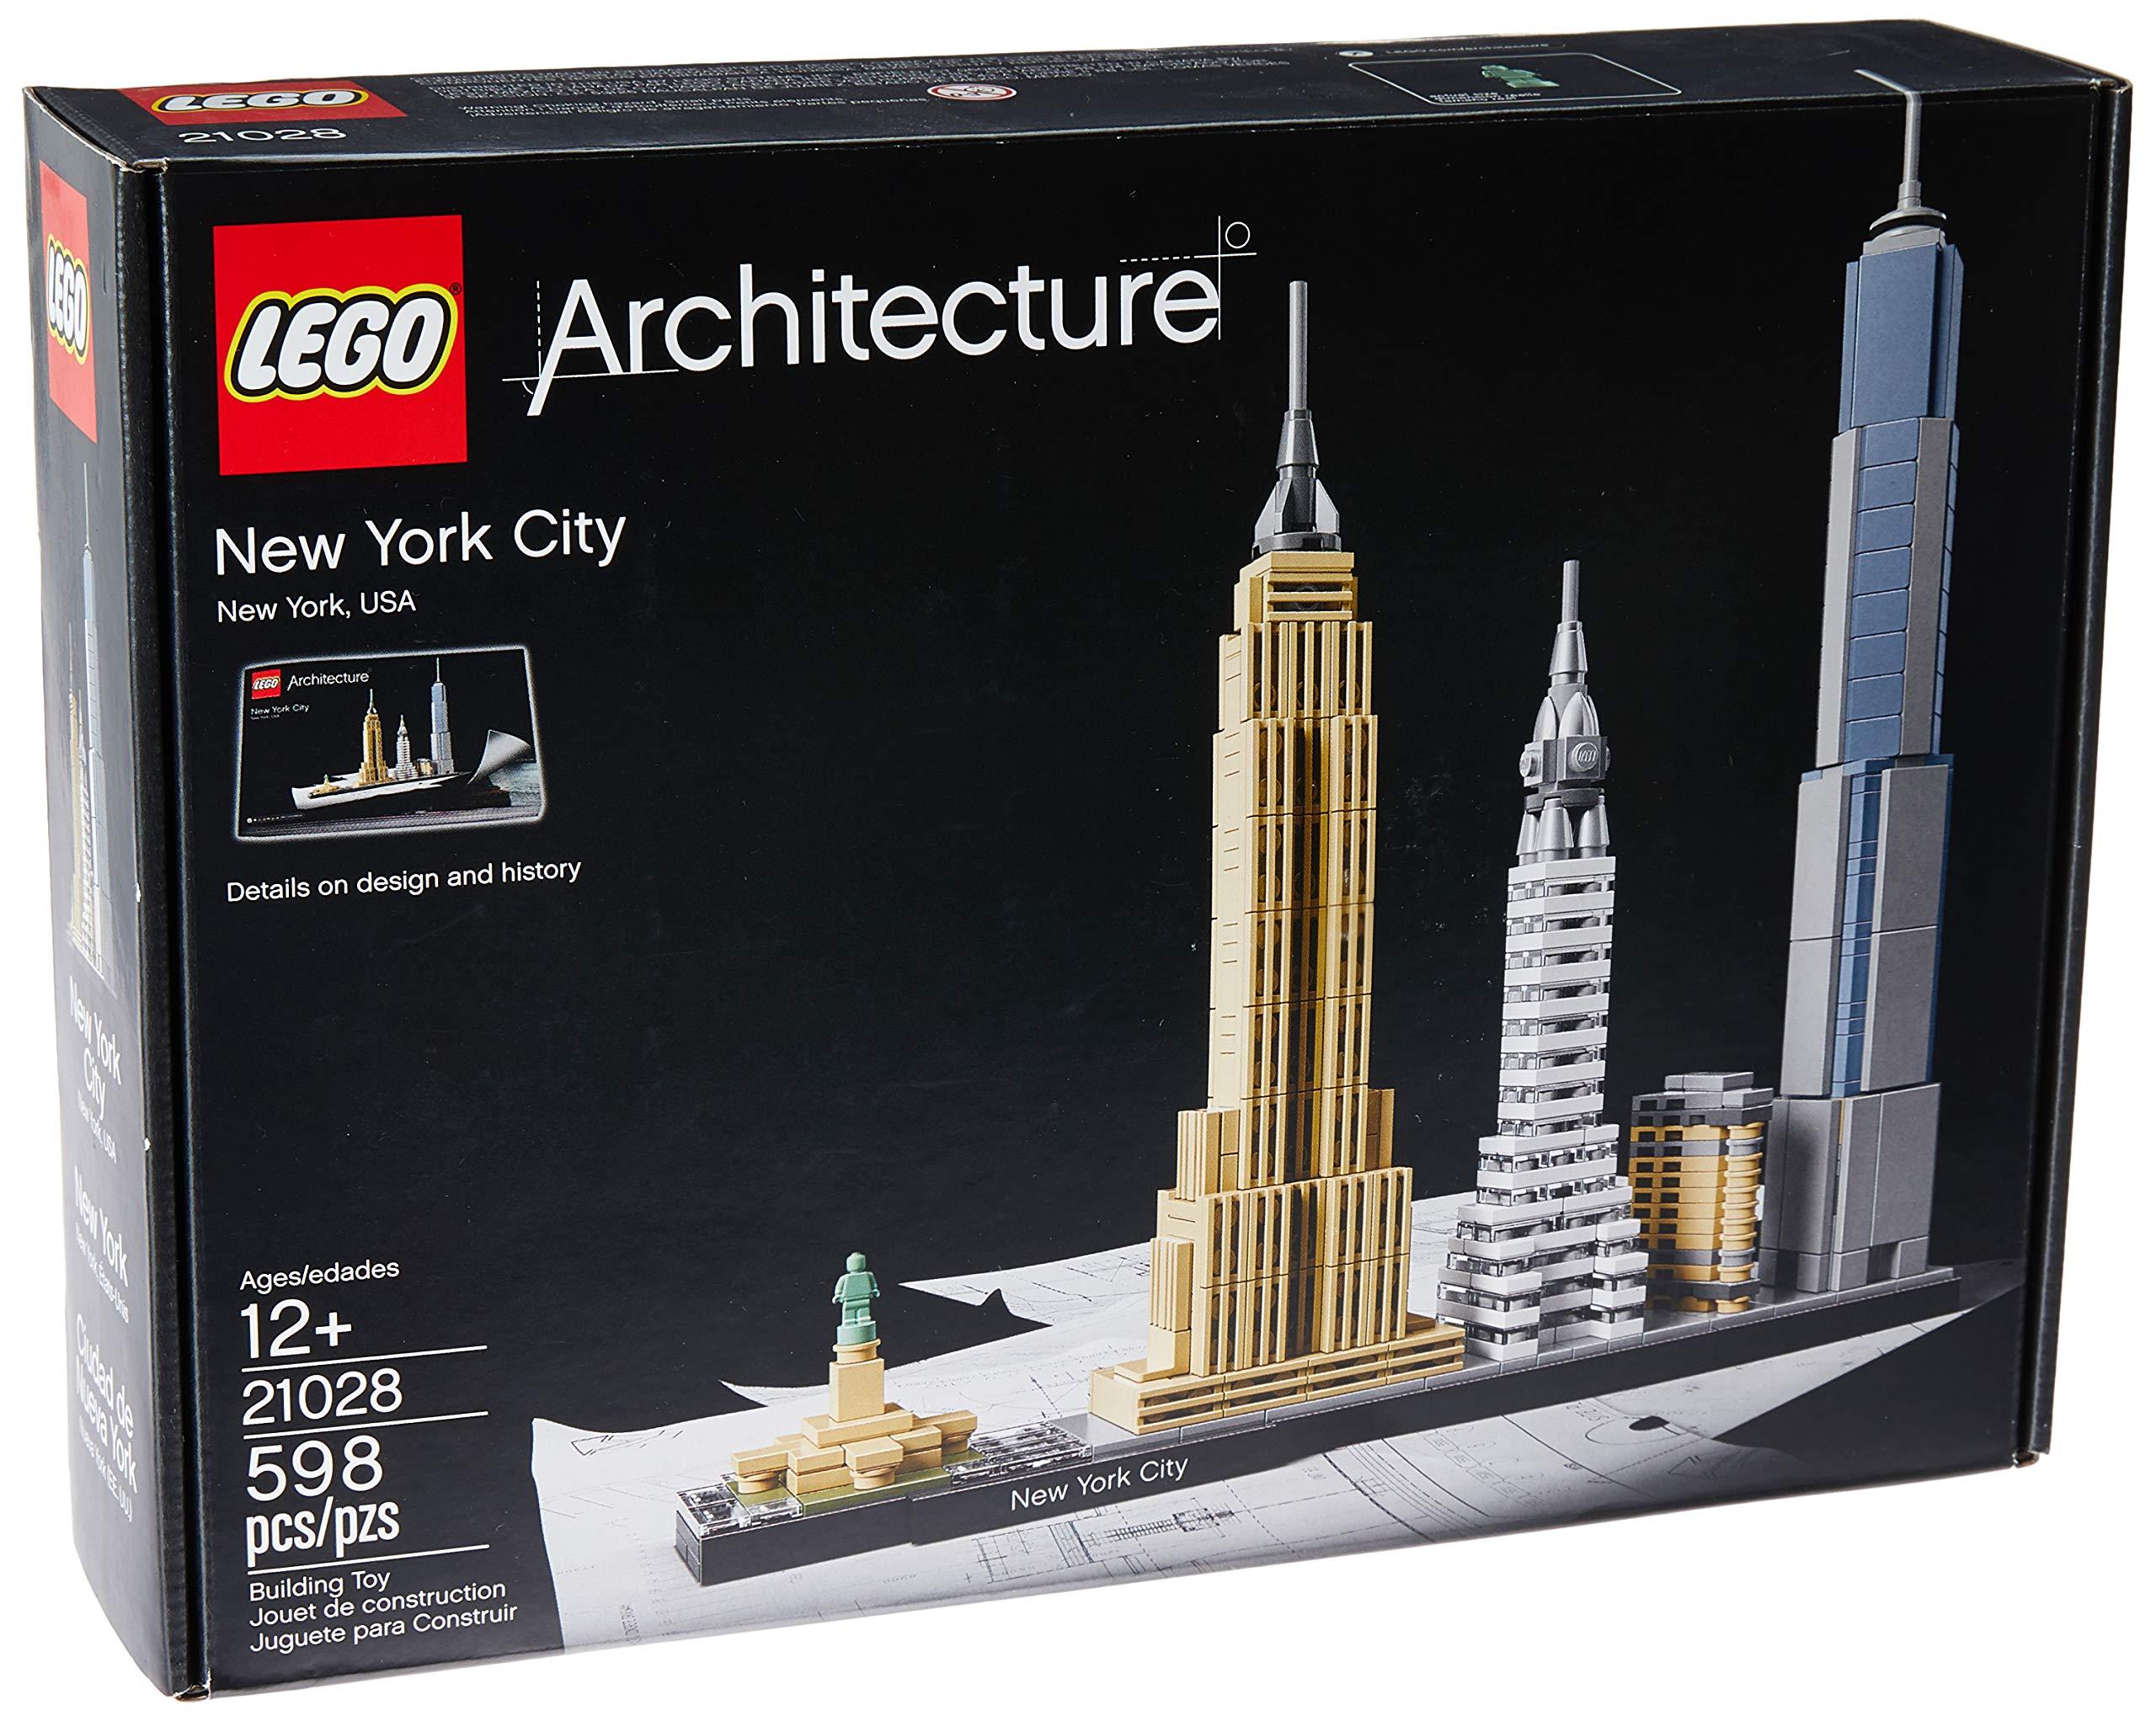 LEGO Architecture New York City 21028, Skyline Collection, Building Blocks